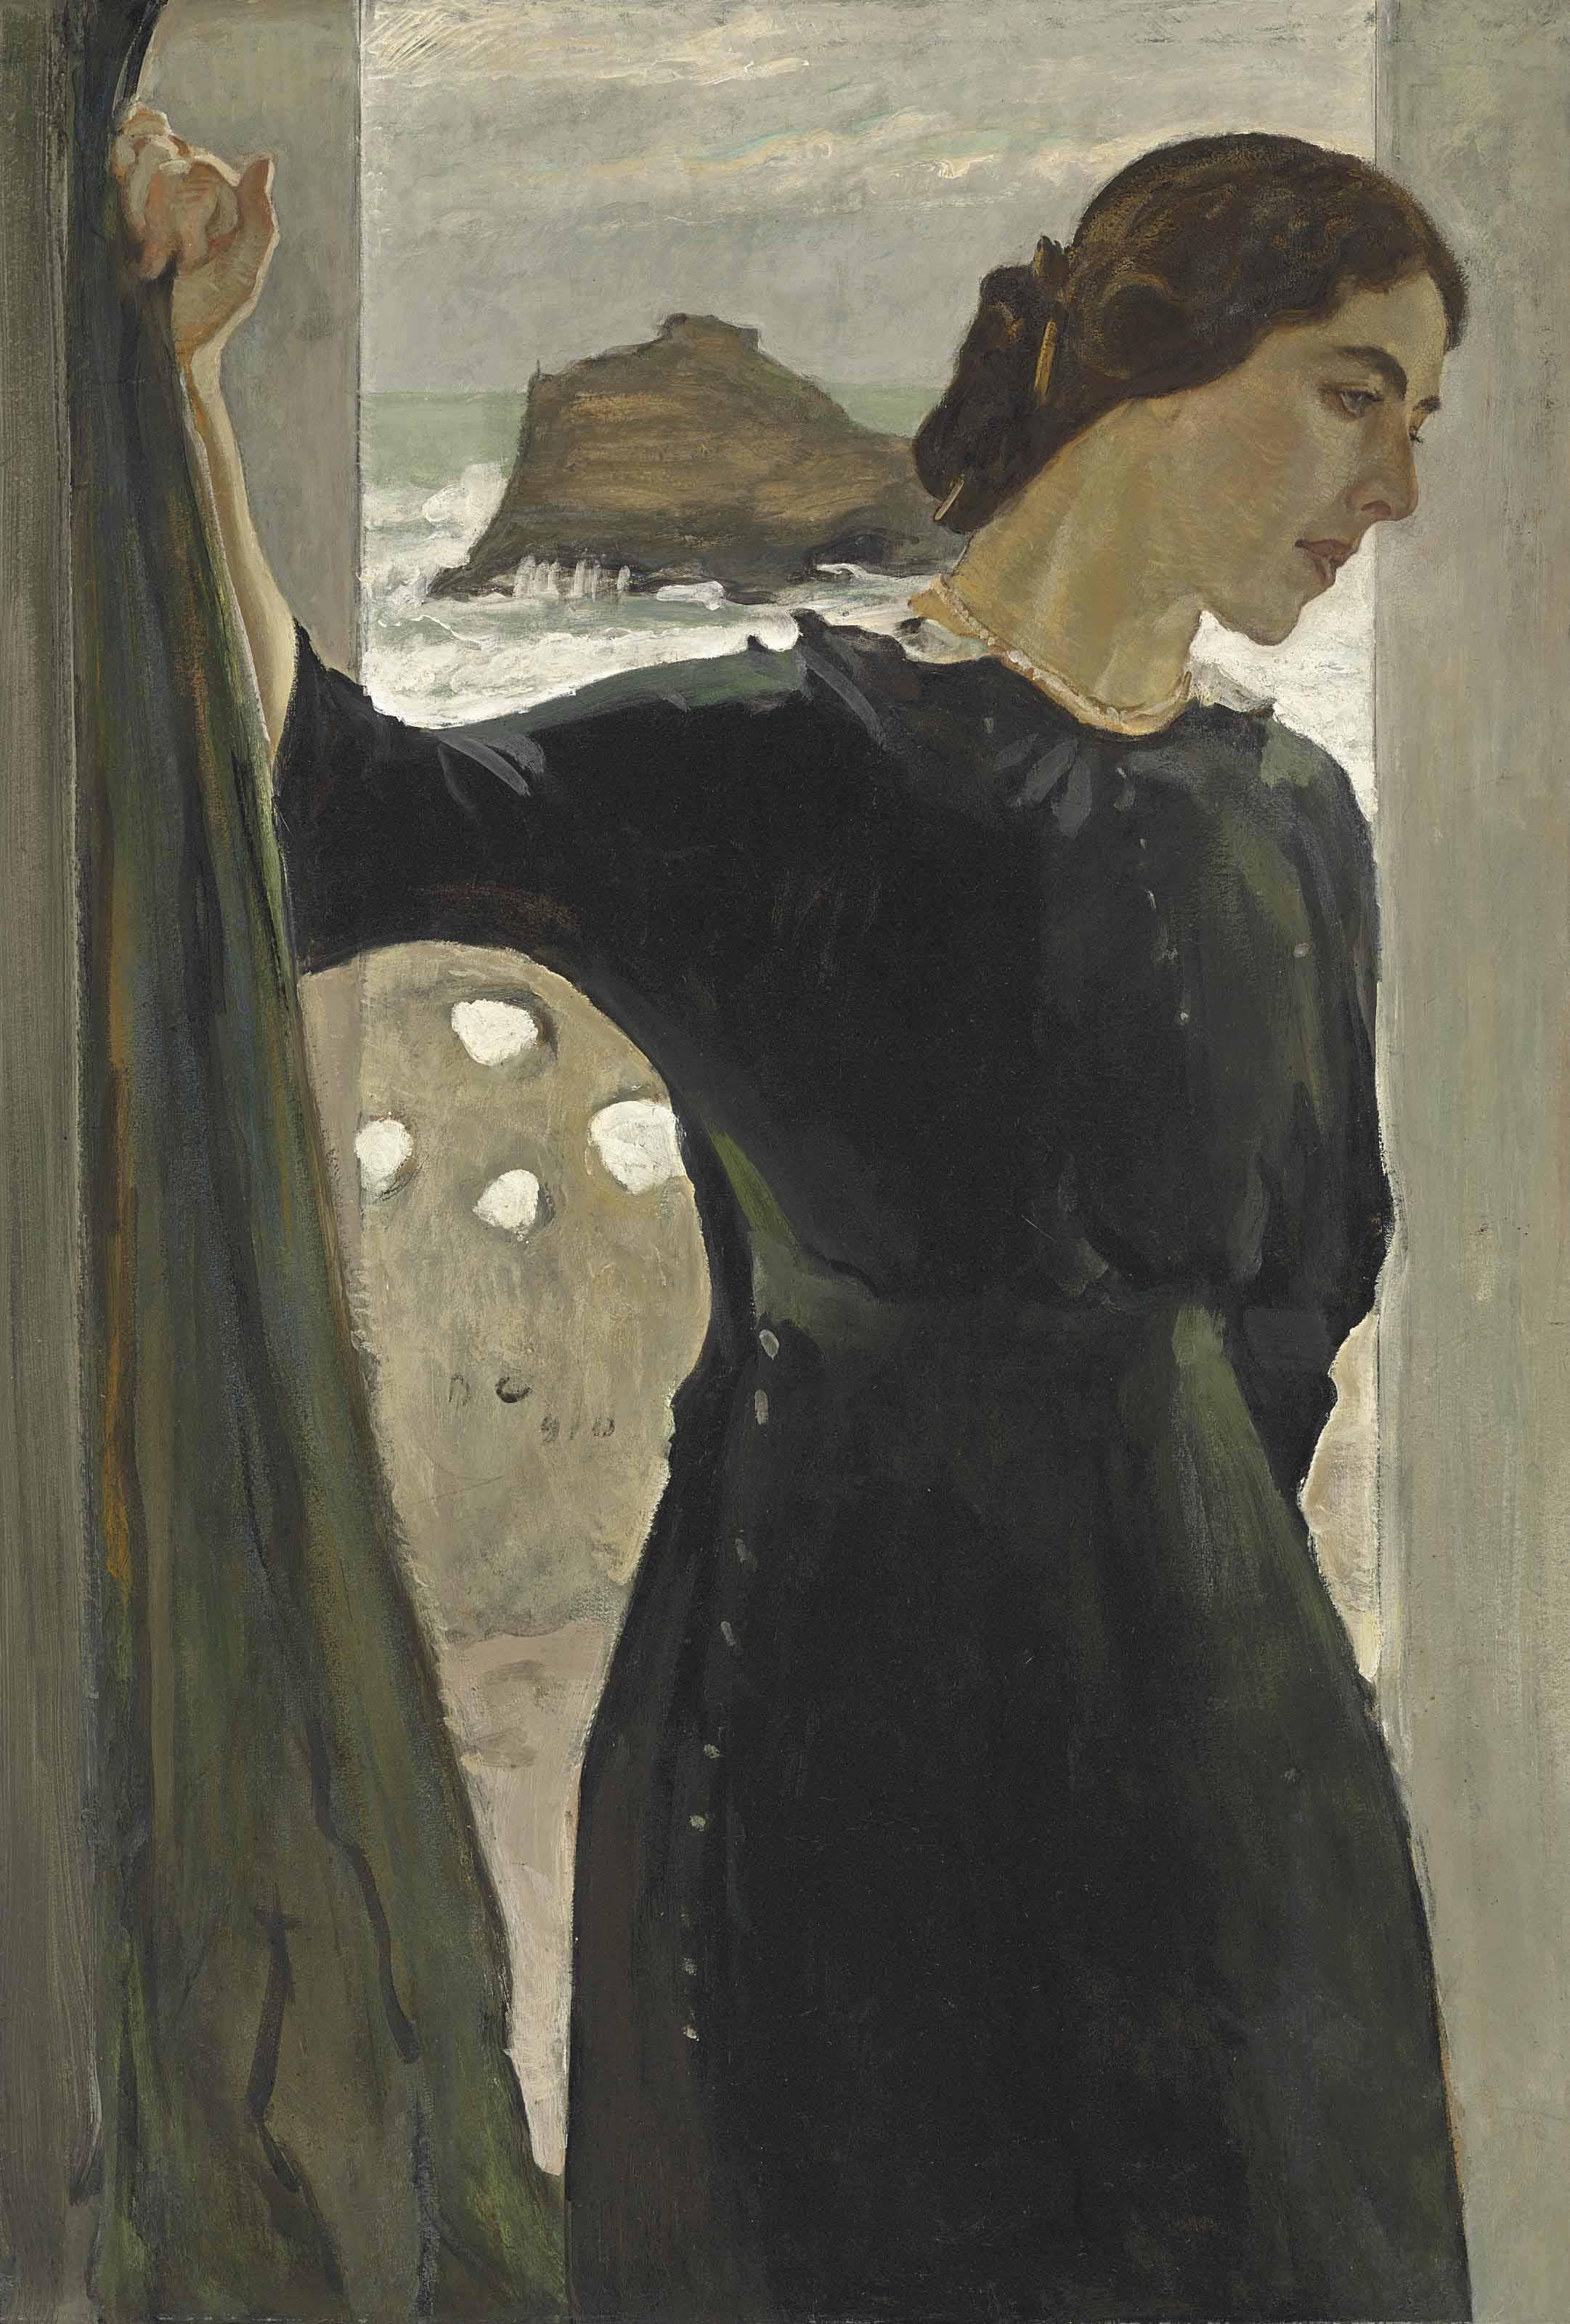 Audio (English): Valentin Serov, Portrait of Maria Zetlin (1882-1976)